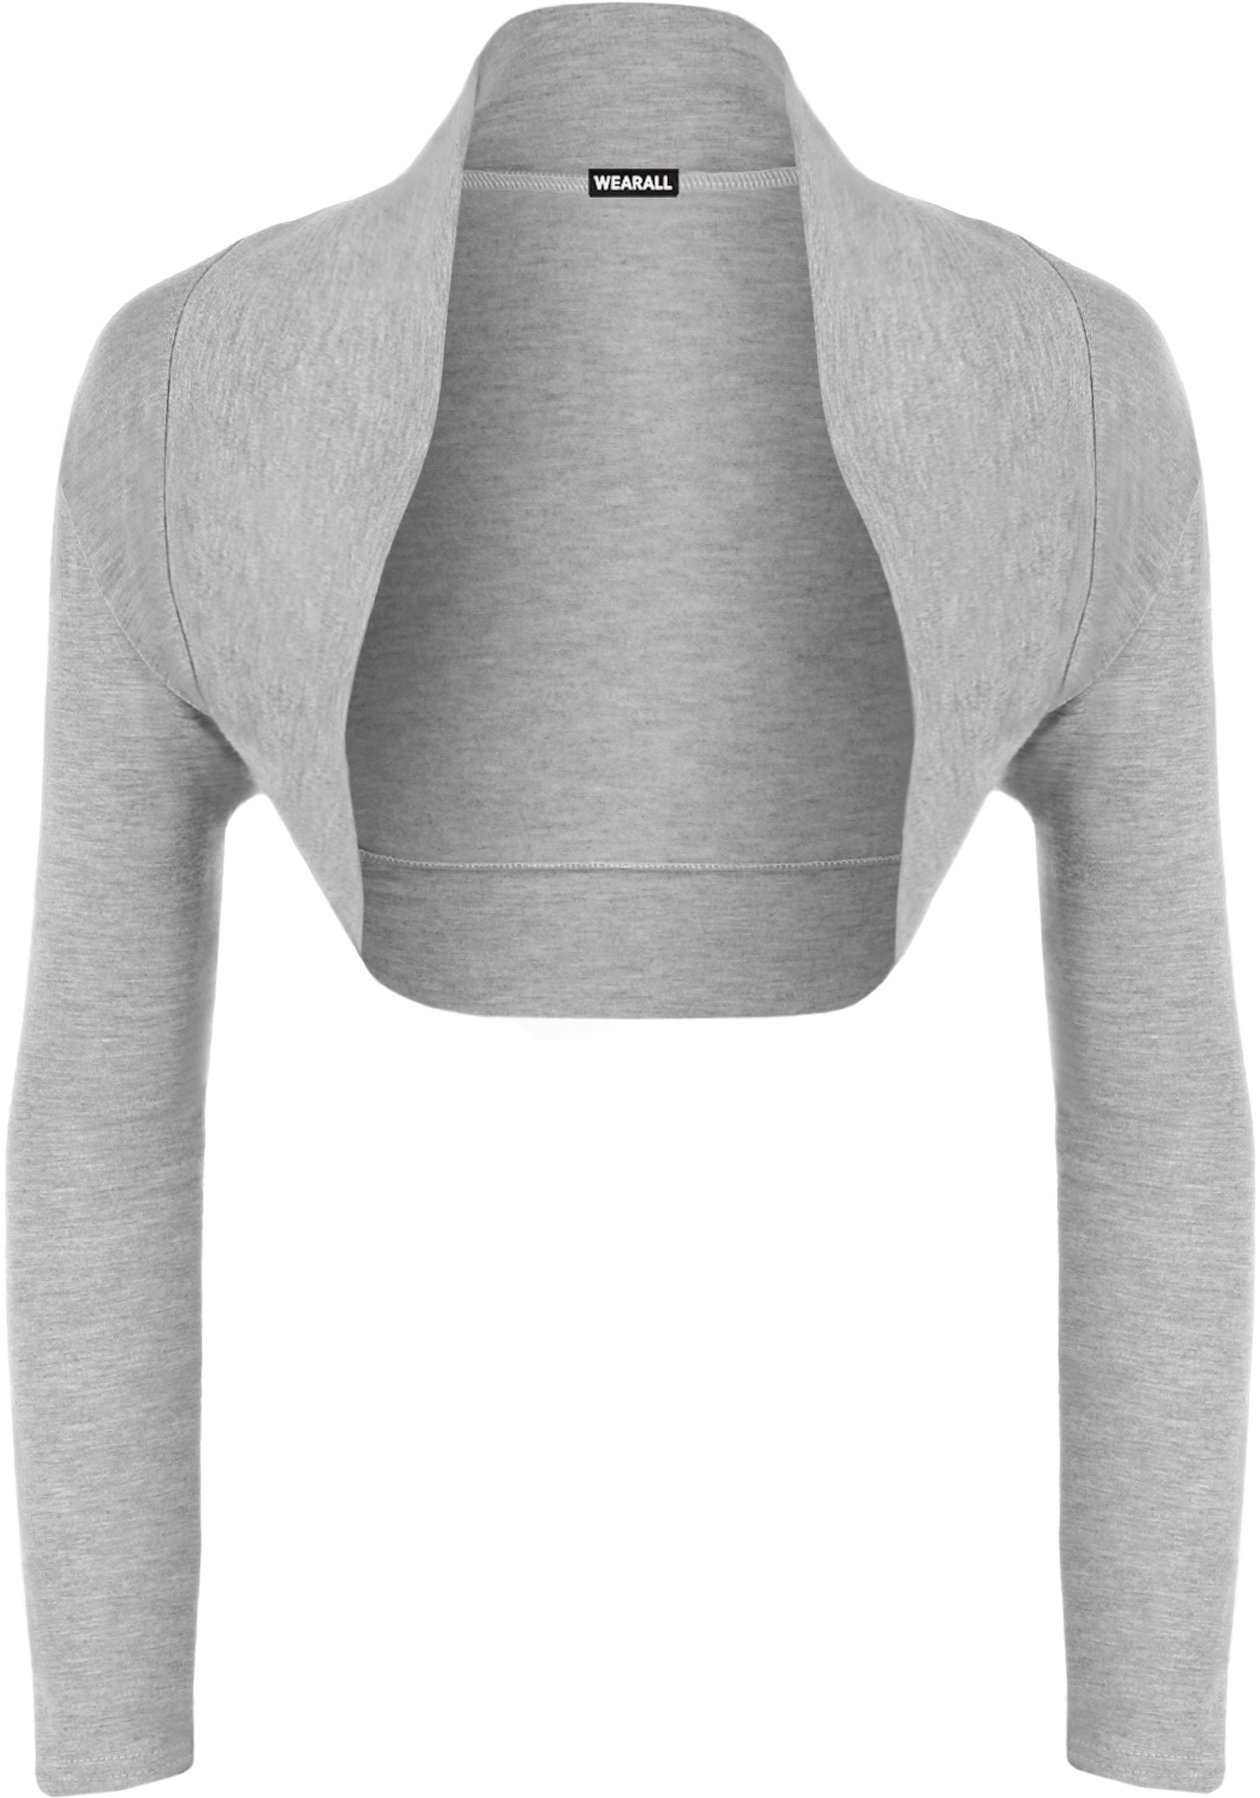 WearAll Womens Long Sleeve Shrug Bolero Cardigan - Grey - US 4-6 (UK 8-10)